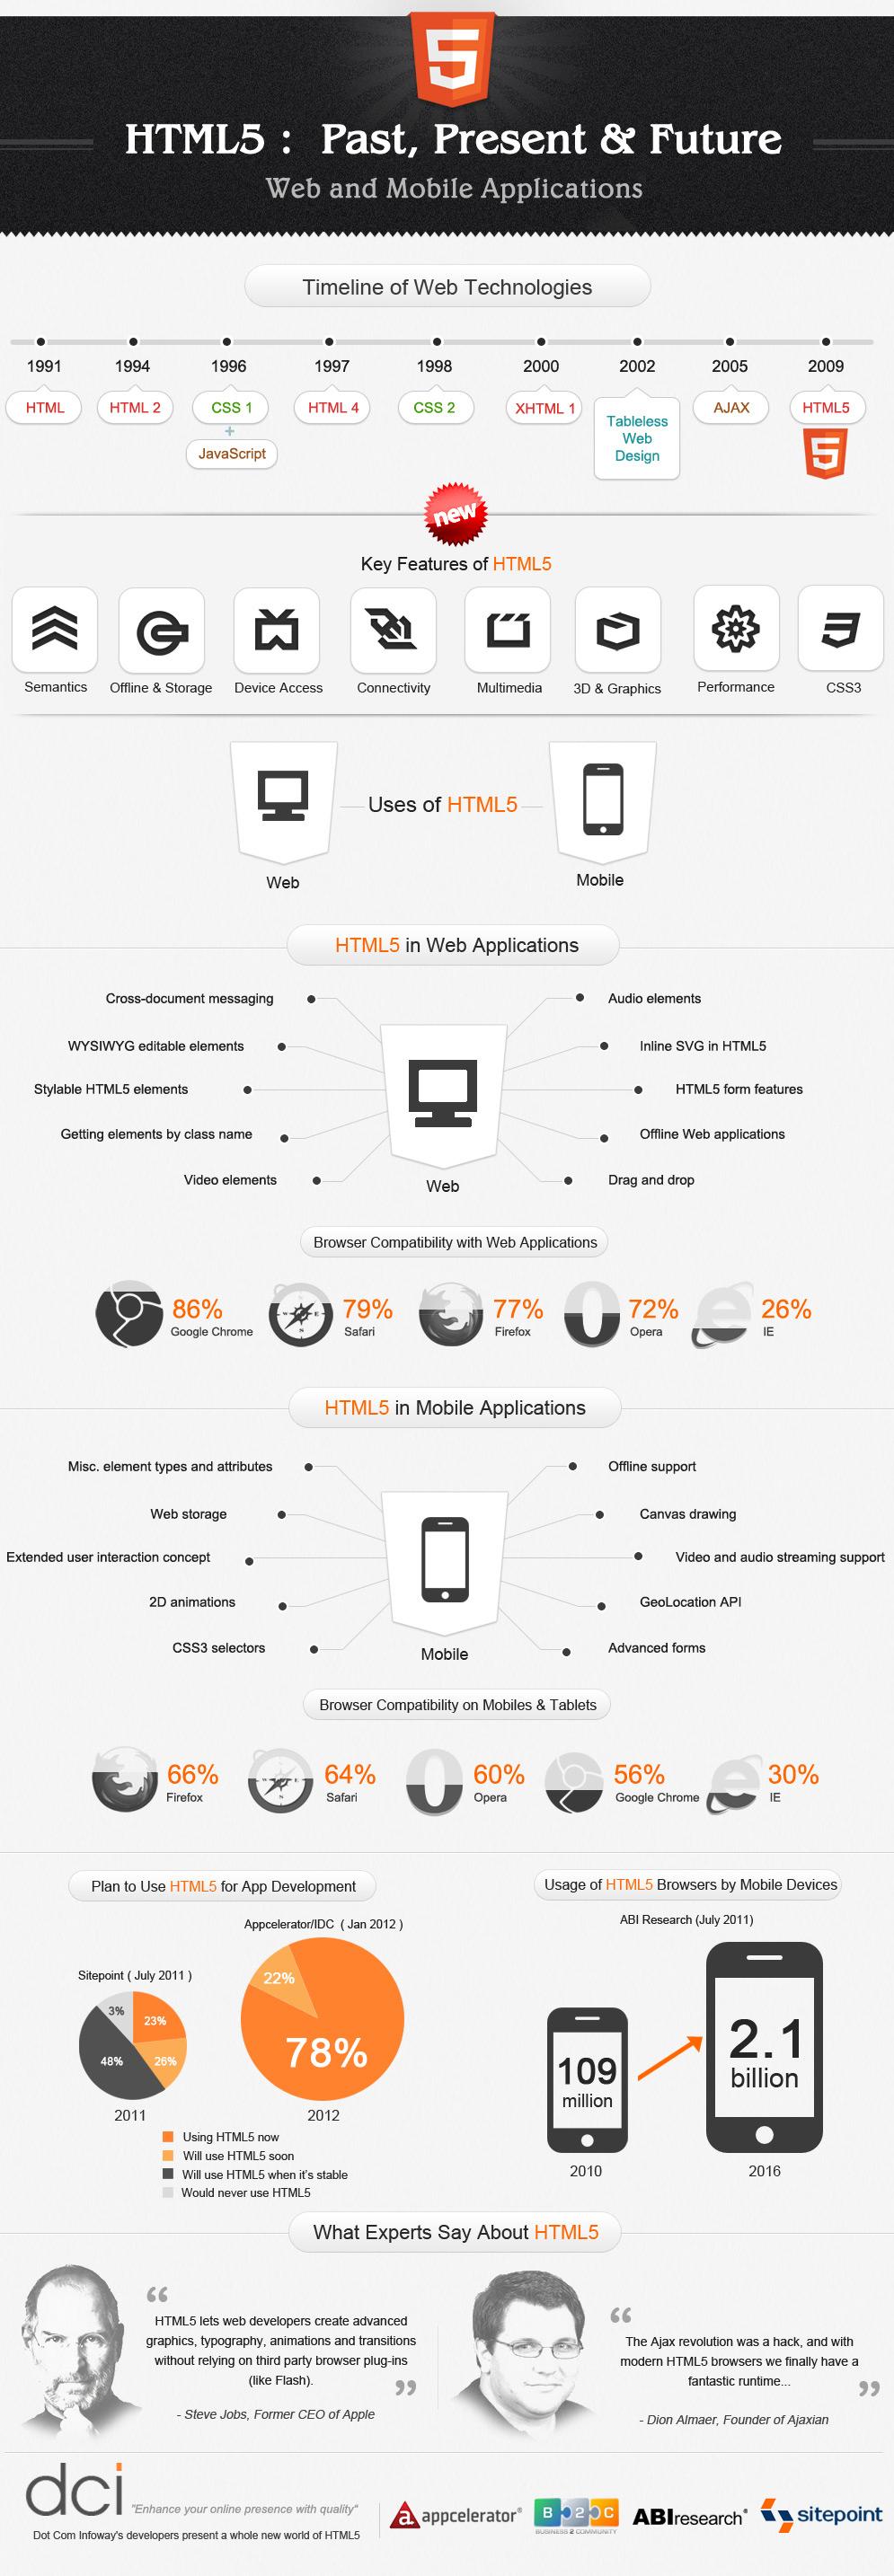 instantShift - The Evolution of HTML5